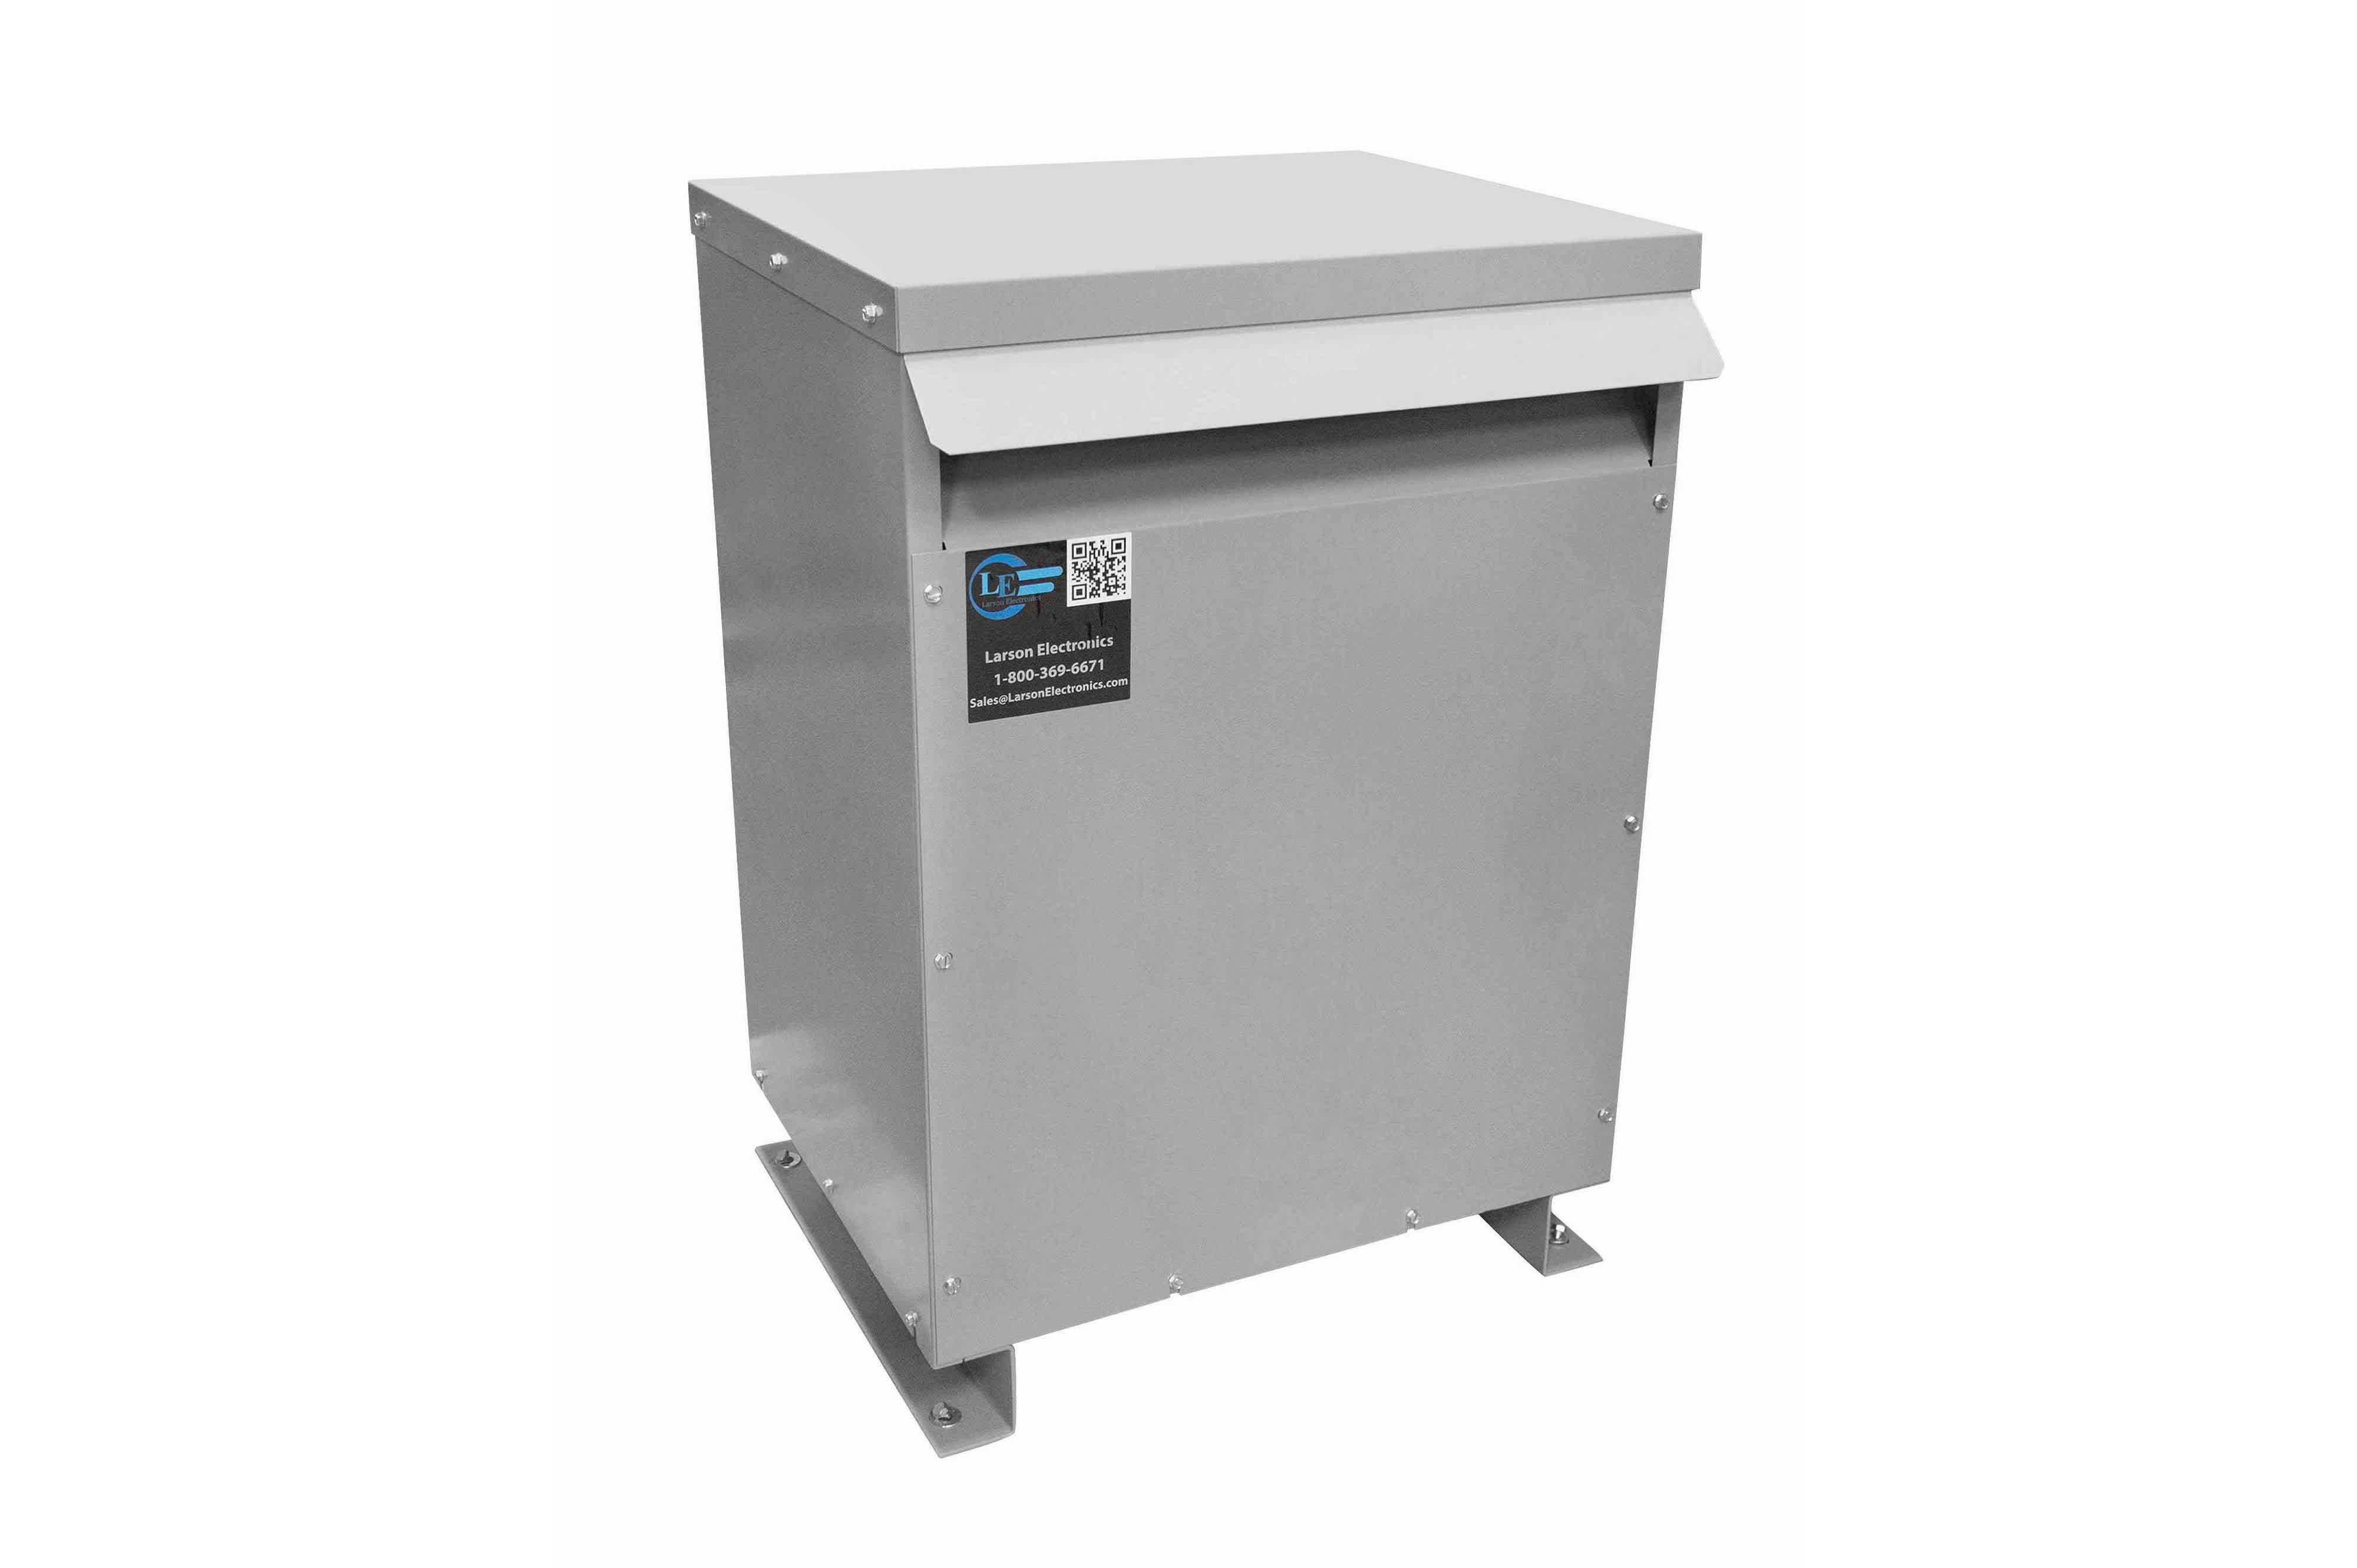 80 kVA 3PH Isolation Transformer, 380V Wye Primary, 240V Delta Secondary, N3R, Ventilated, 60 Hz